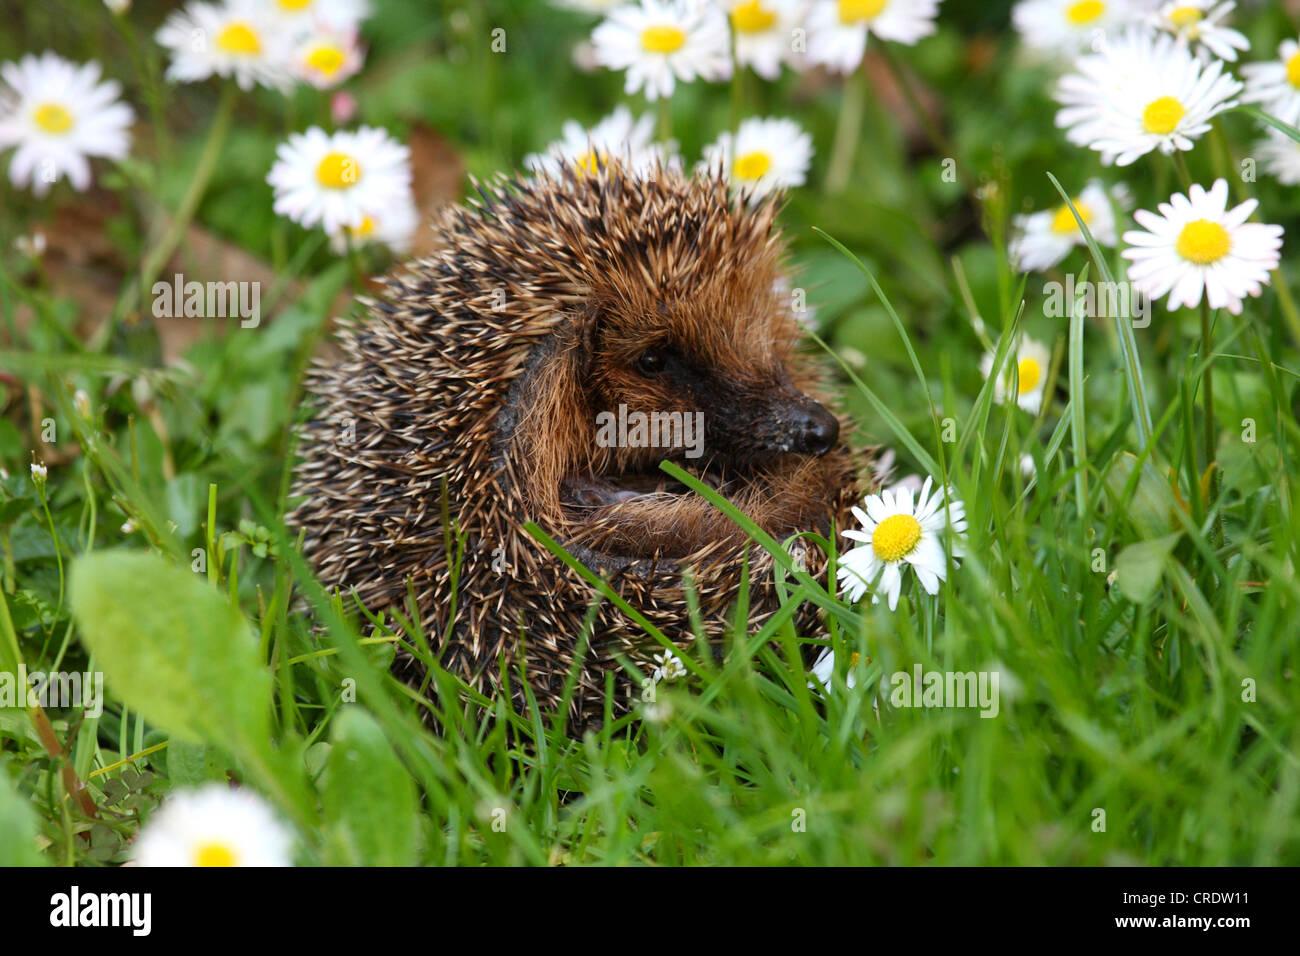 Western hedgehog, European hedgehog (Erinaceus europaeus), on meadow with daisies - Stock Image